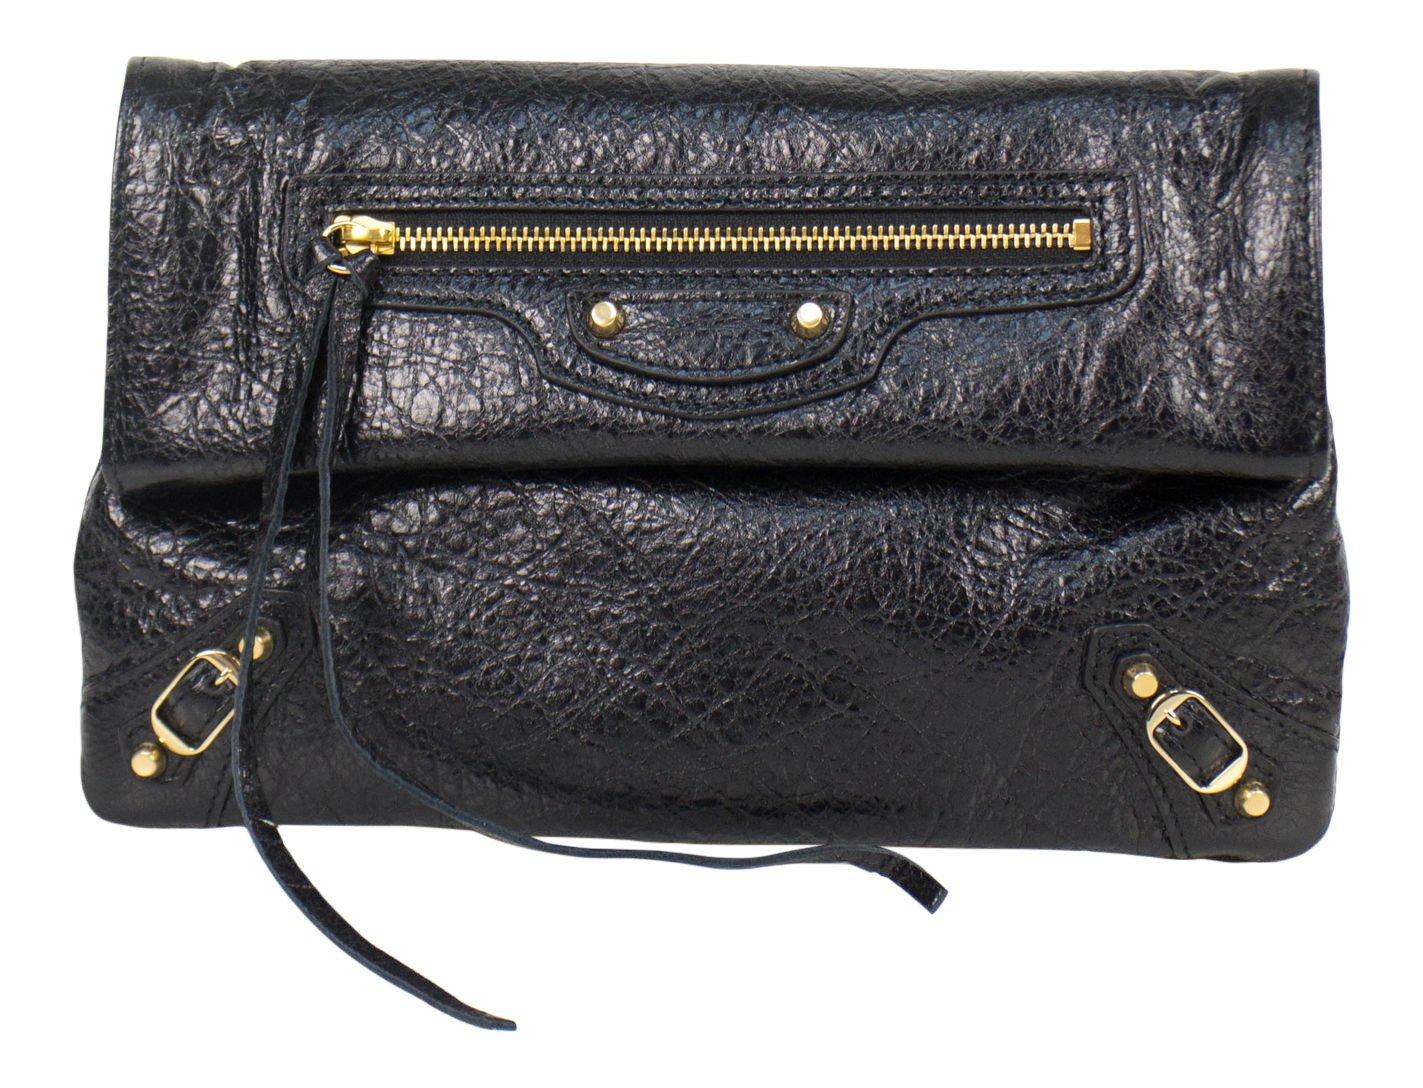 f43b3ce36 Amazon.com: Balenciaga Black Leather Classic Mini Envelope Cross-Body Bag:  Baby